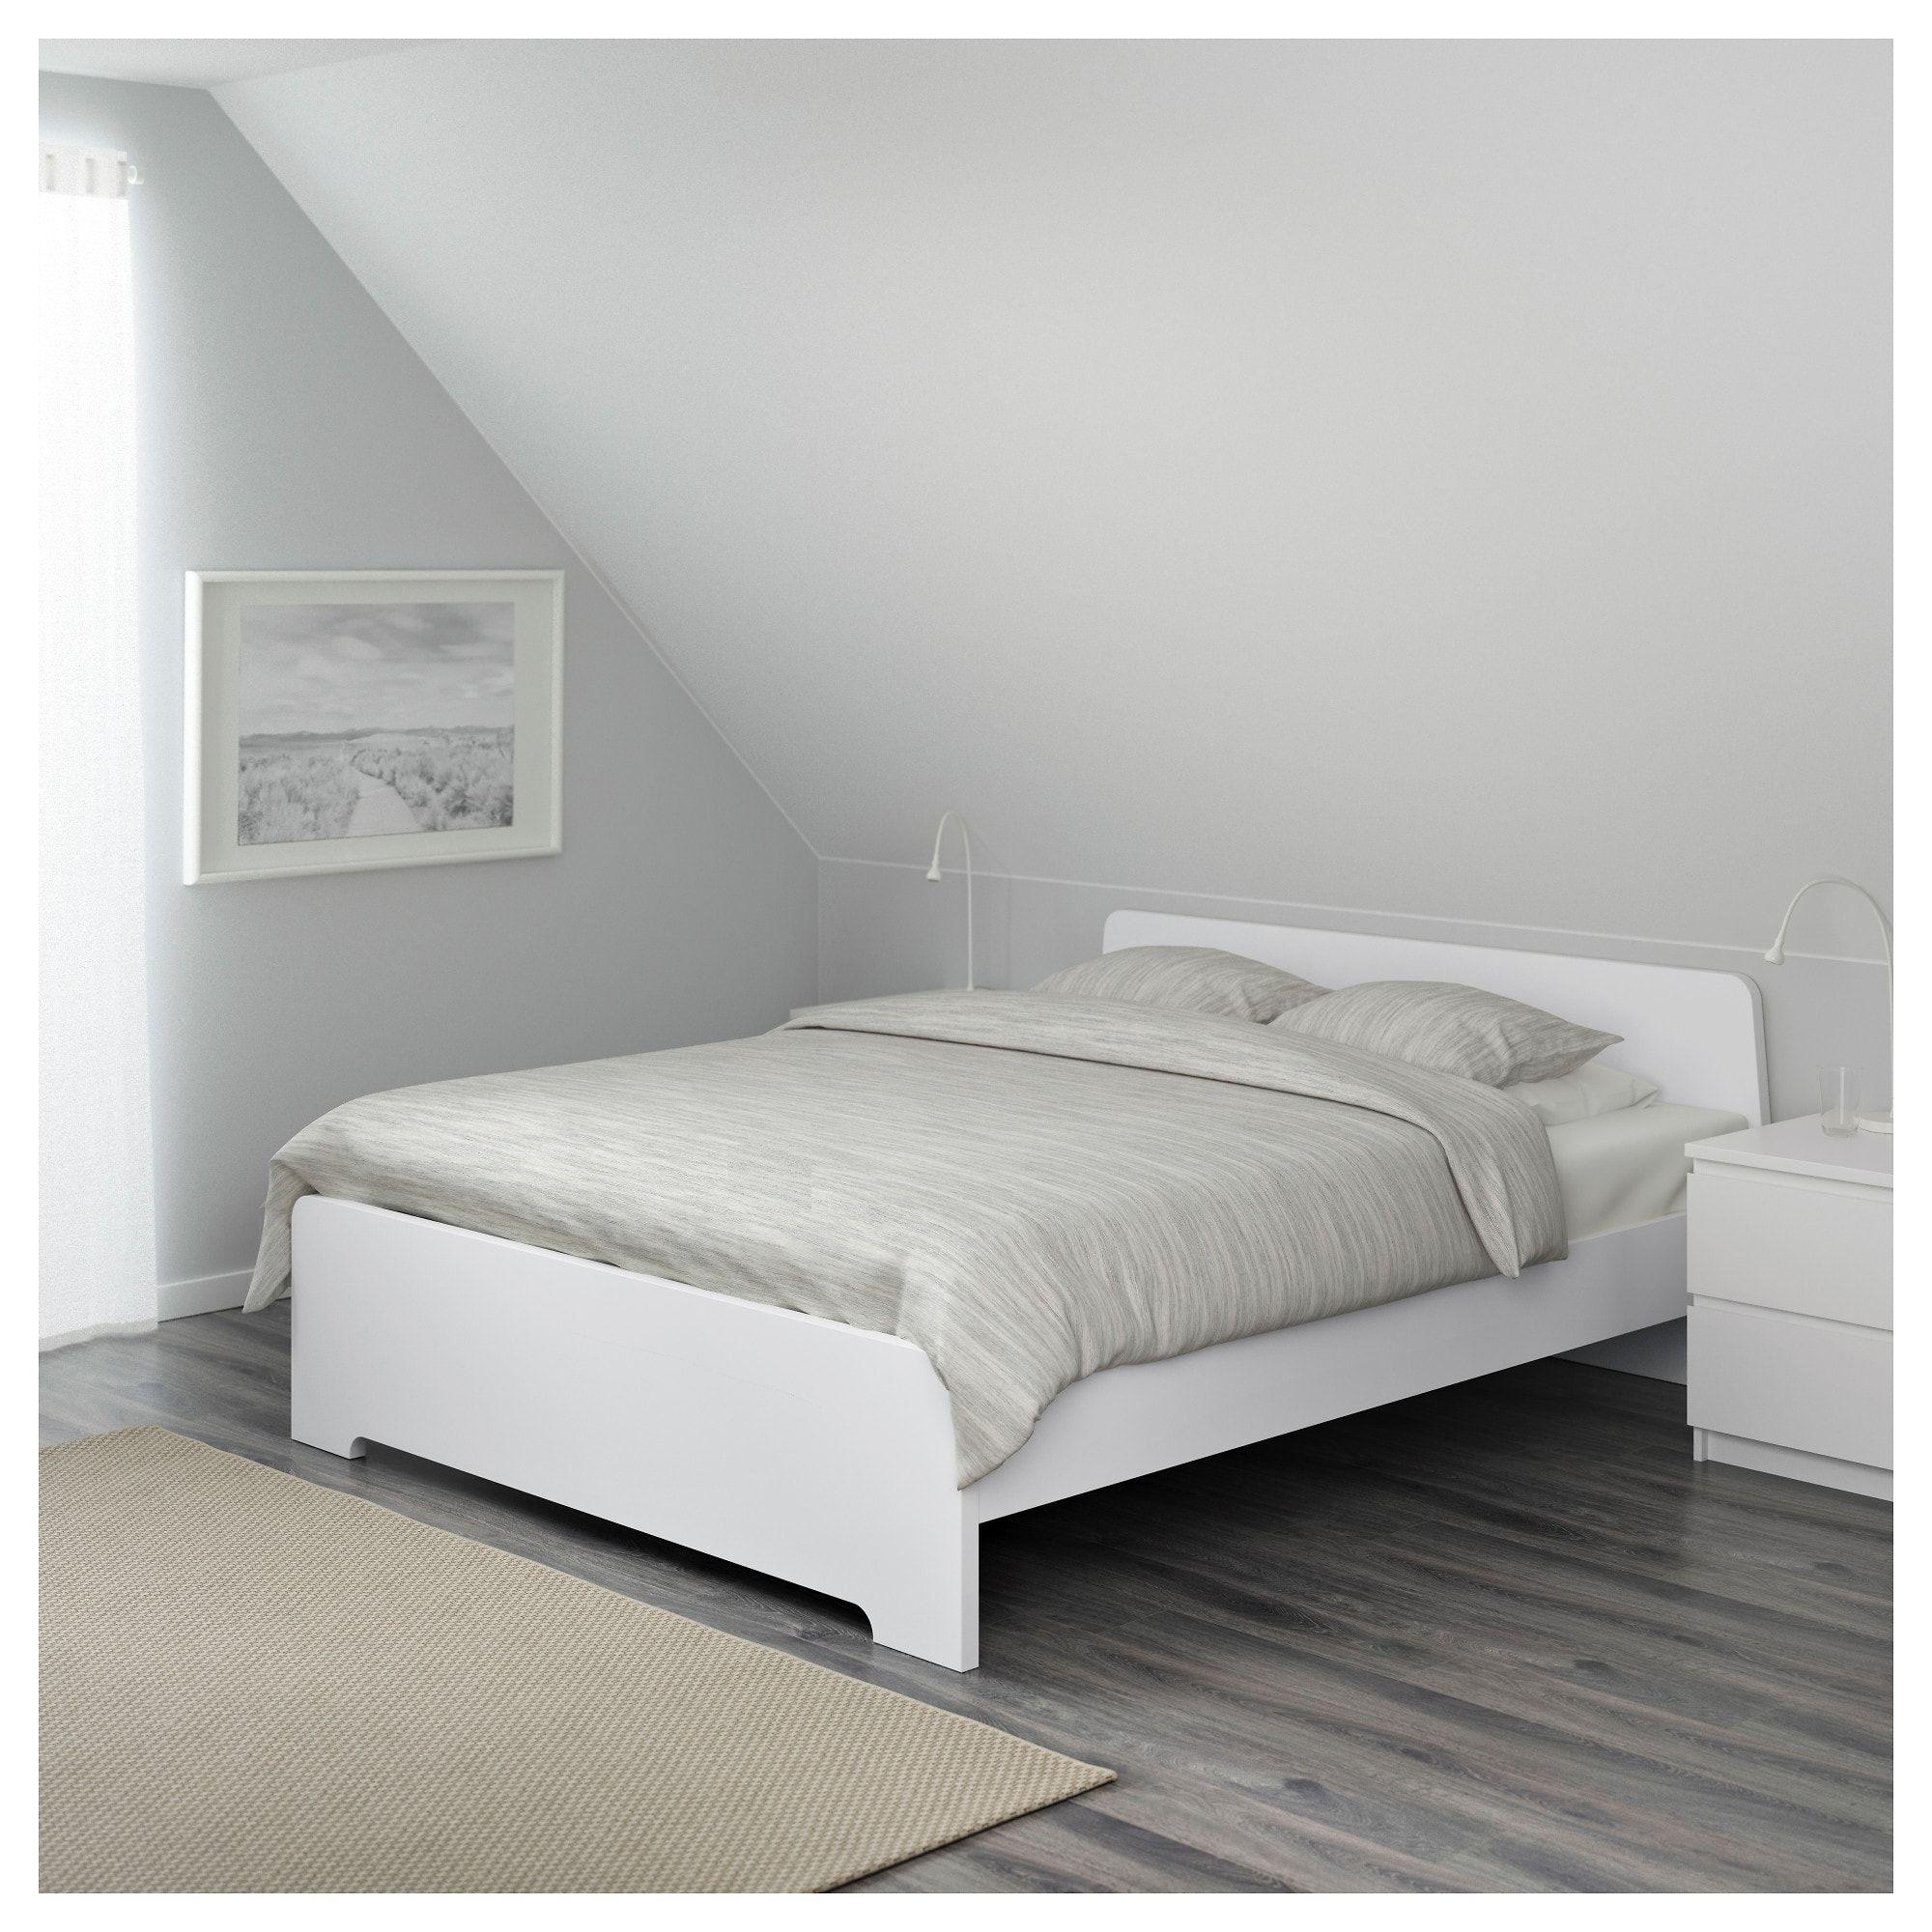 Ikea Askvoll Bed Frame White Lönset In 2019